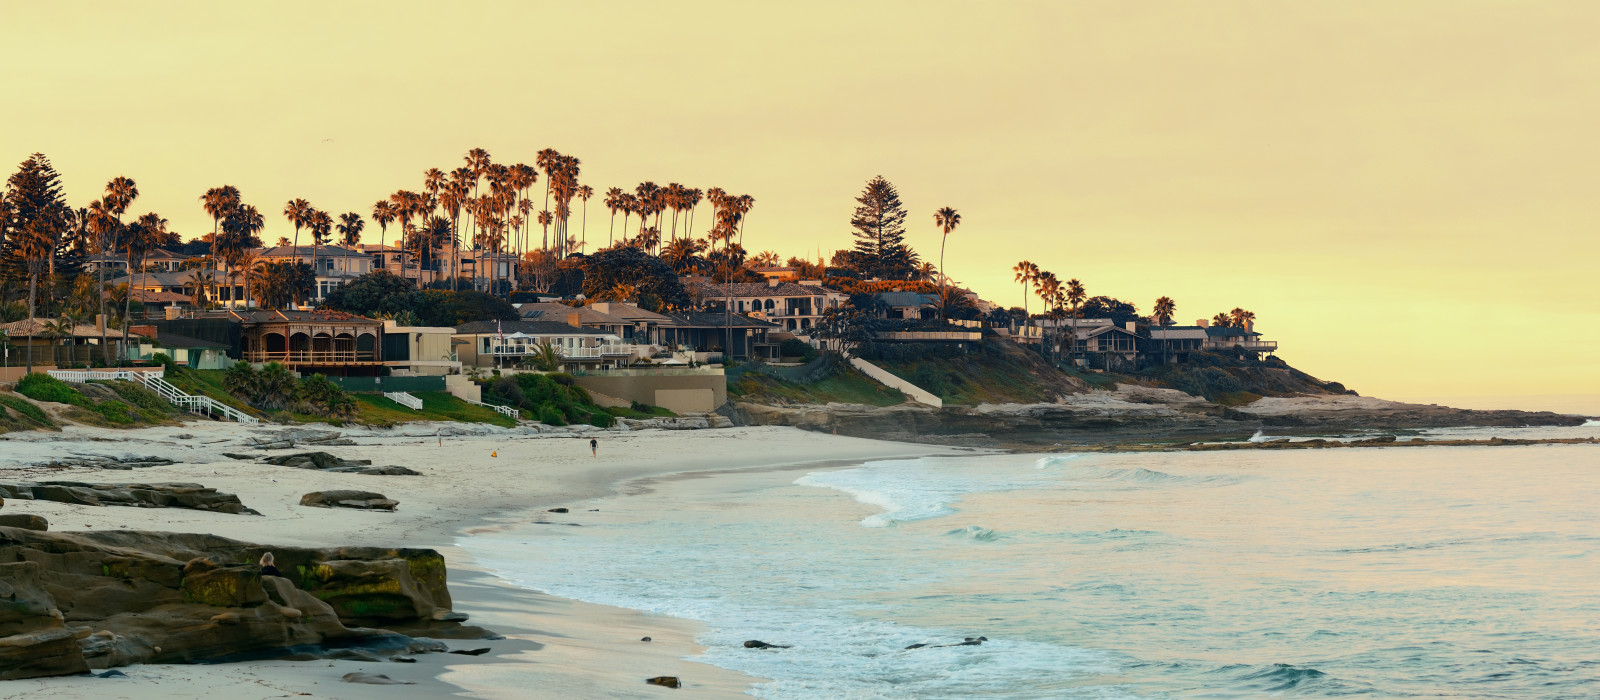 Road Trip: Southern California Dreams Tour Trip 1